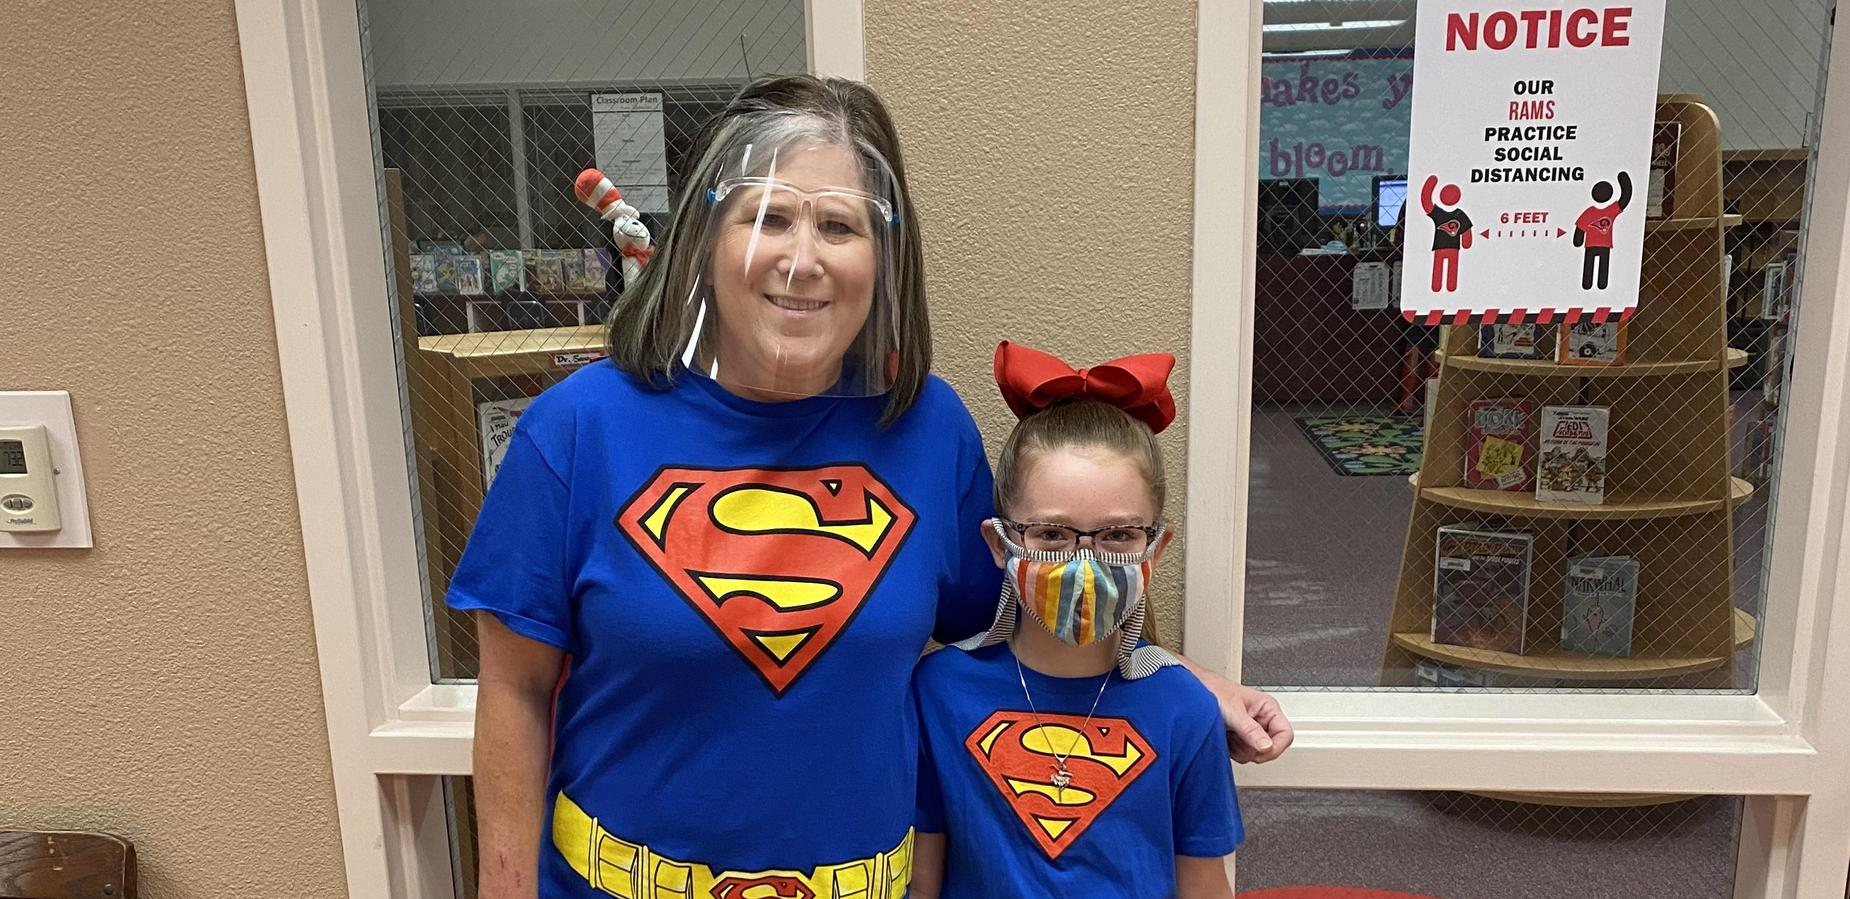 Wear superhero shirt